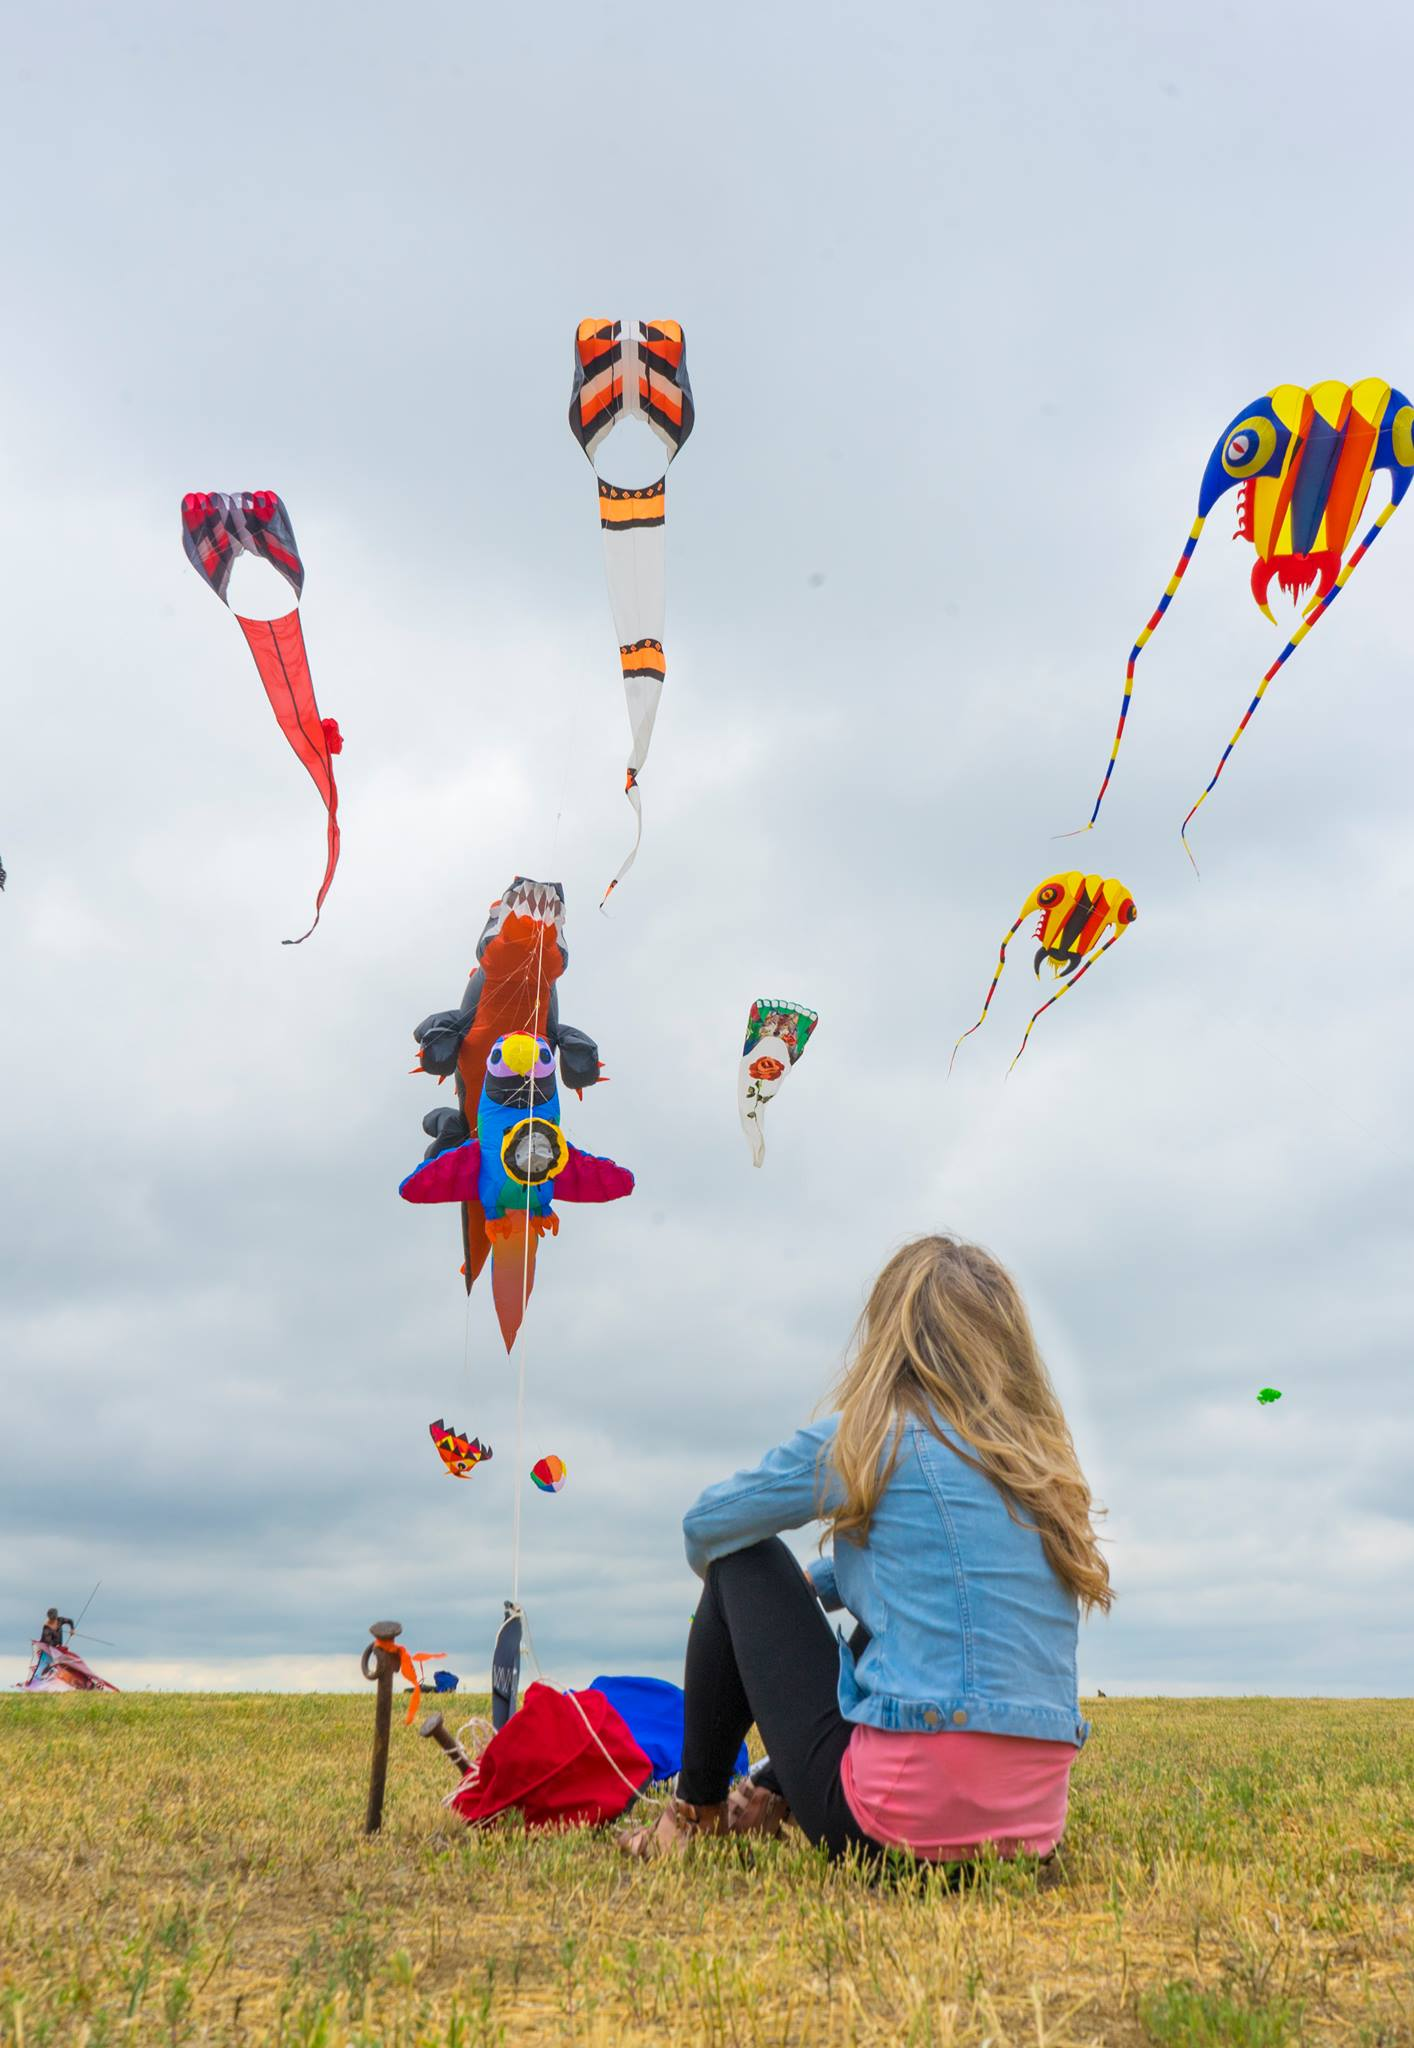 The Art Of Flying Kites At The Windscape Kite Festival